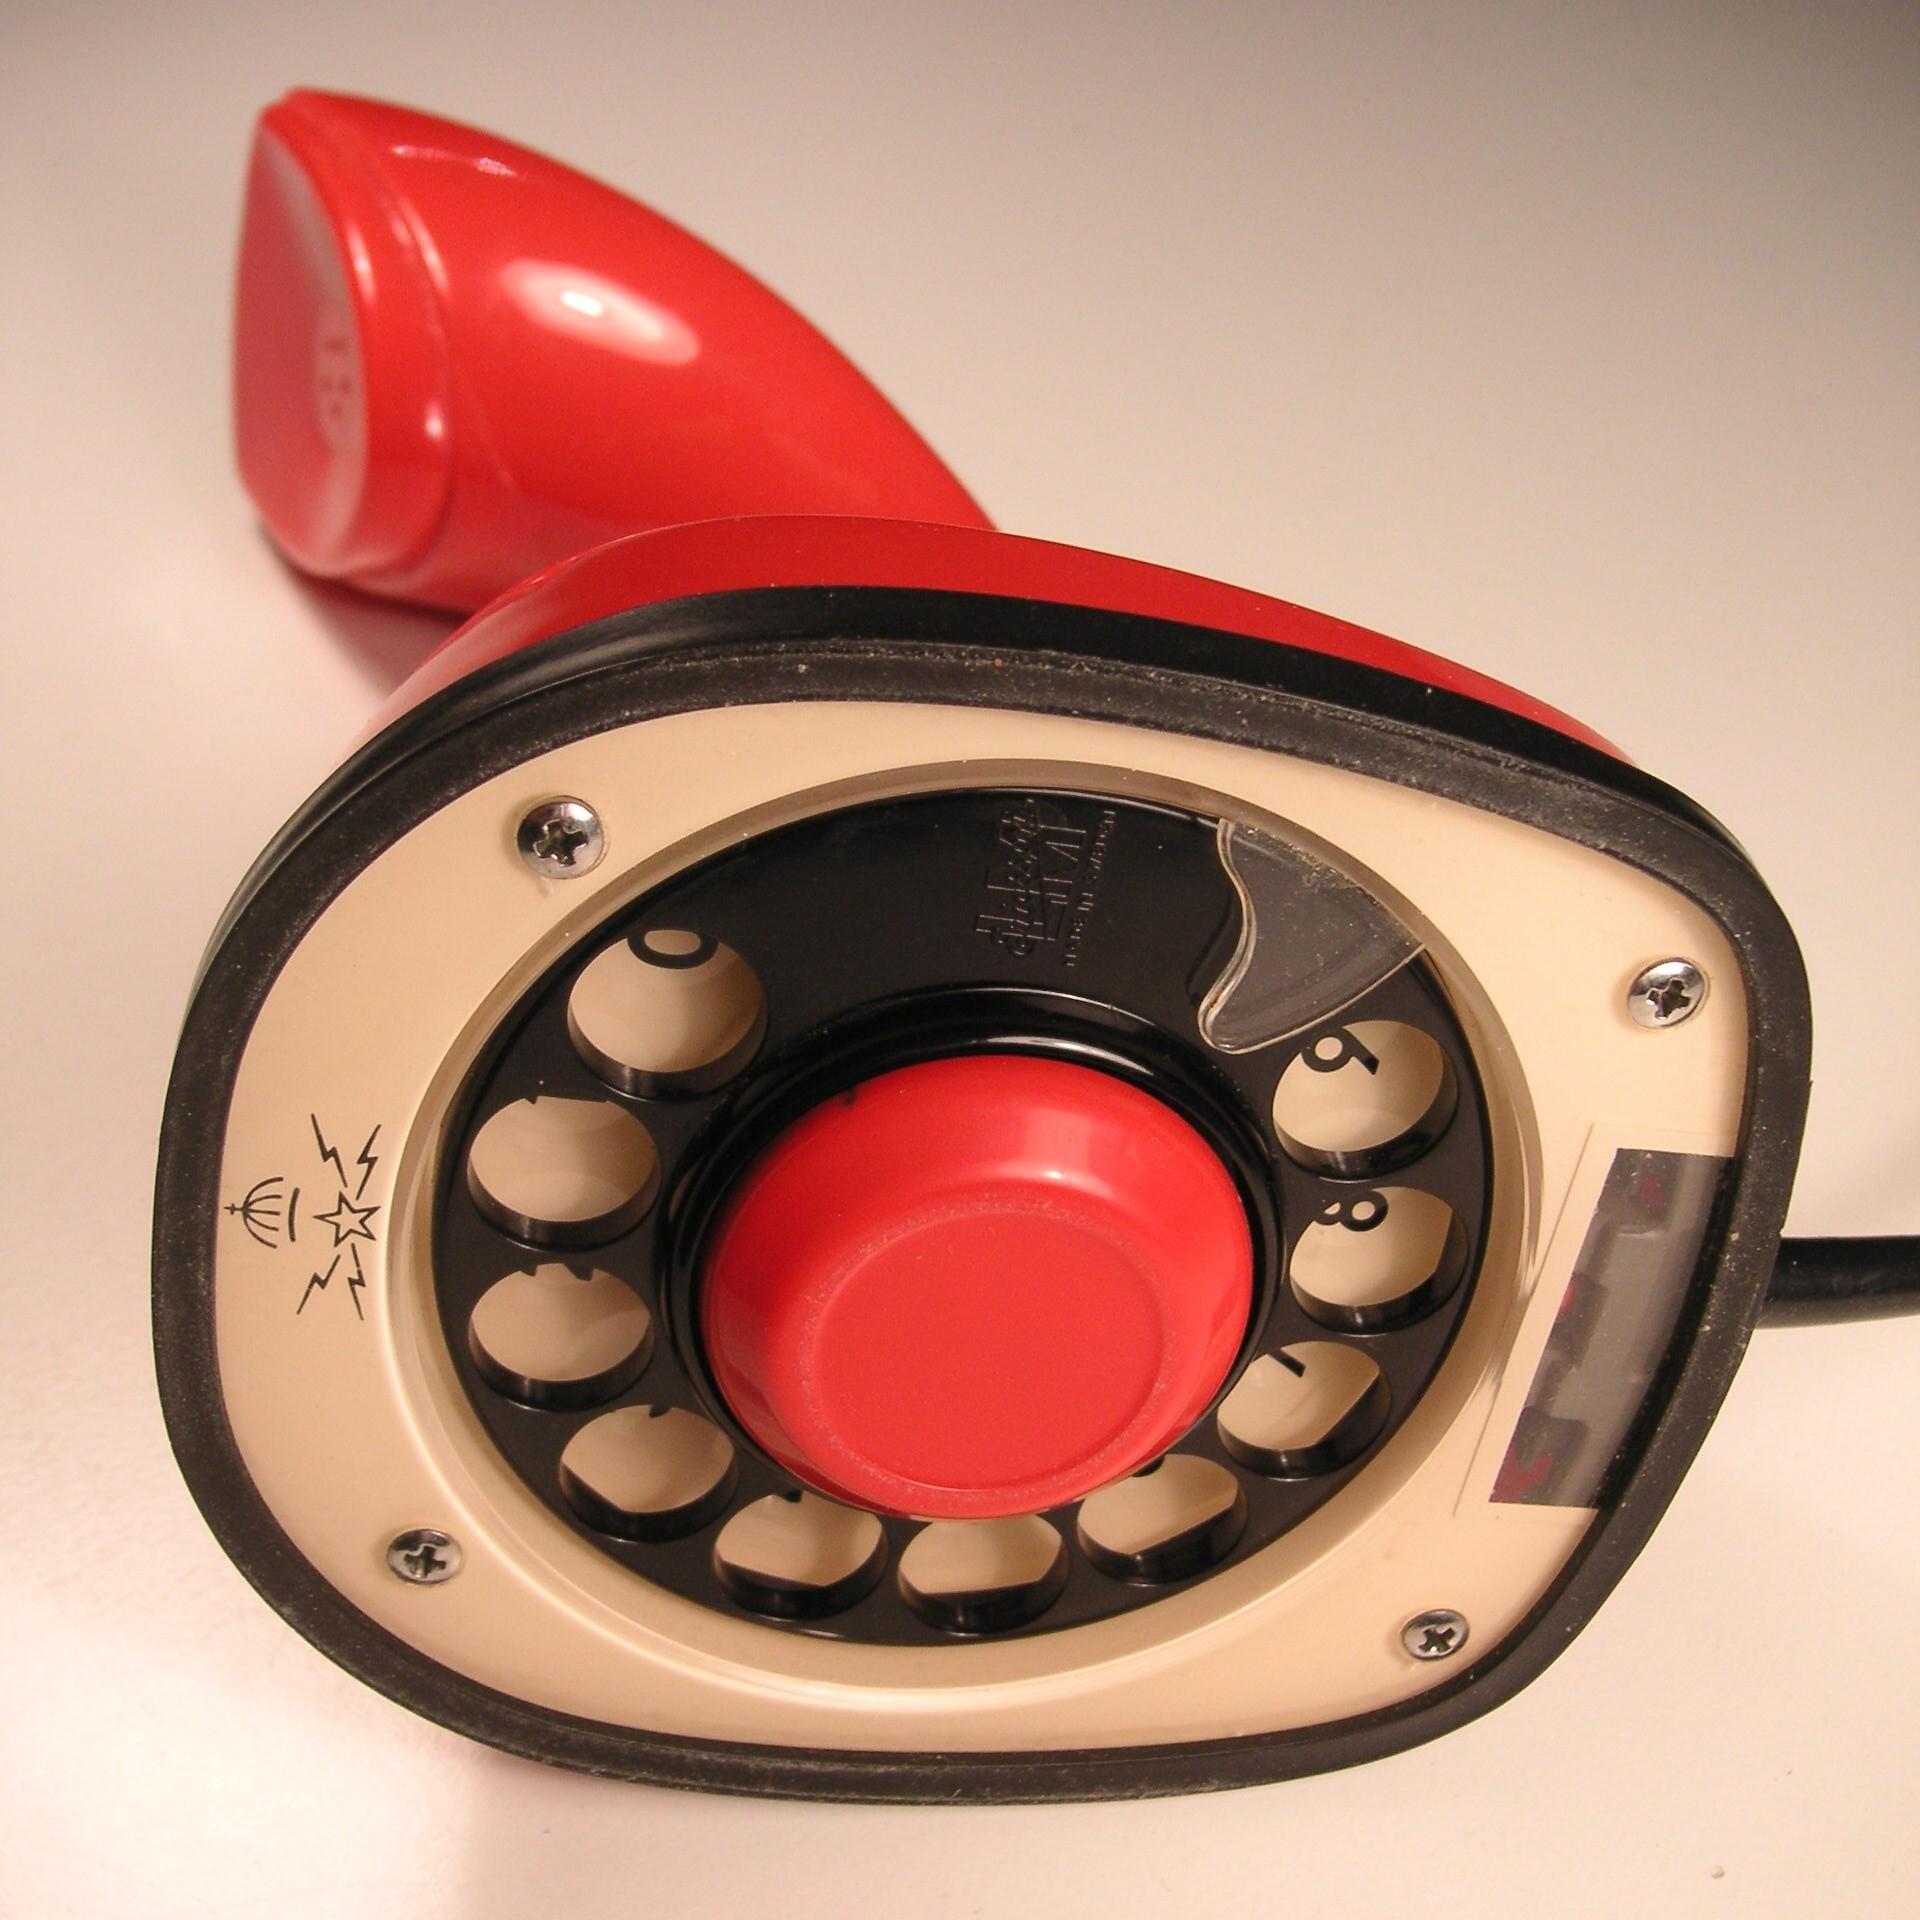 Phone Not Ringing